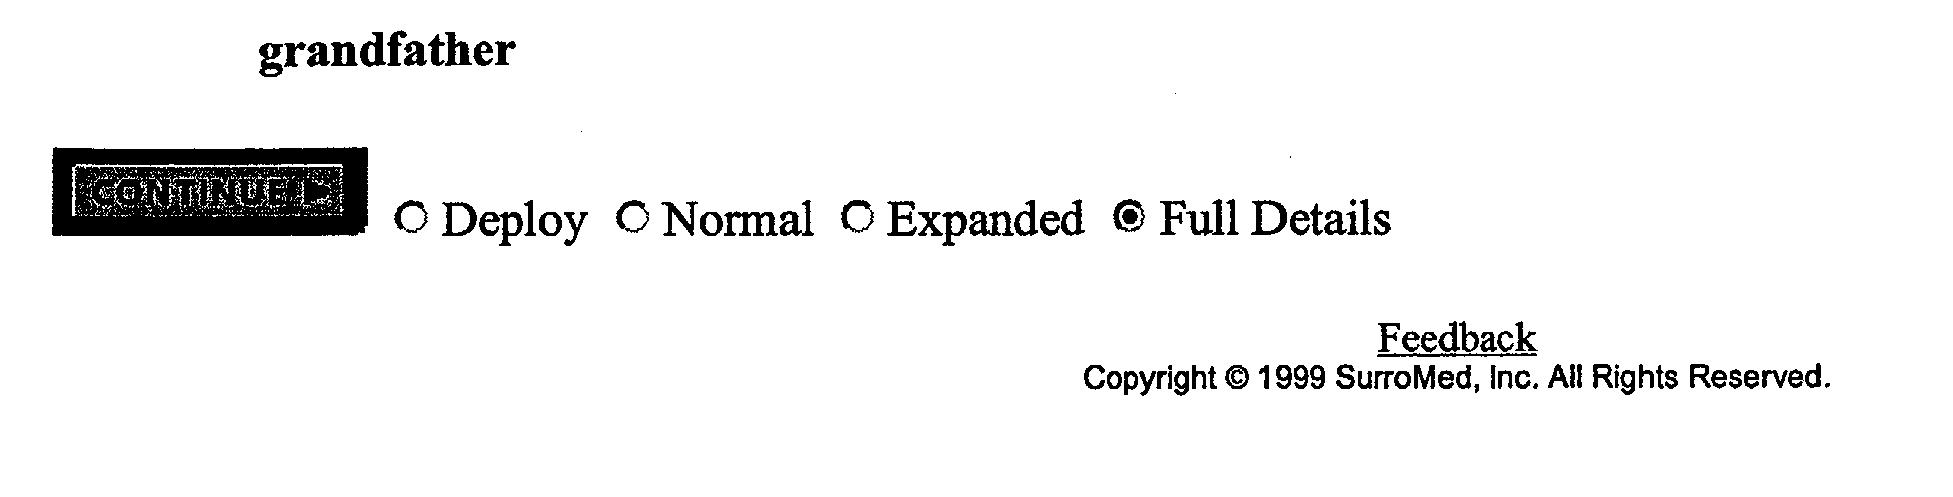 Figure US20020035486A1-20020321-P00028